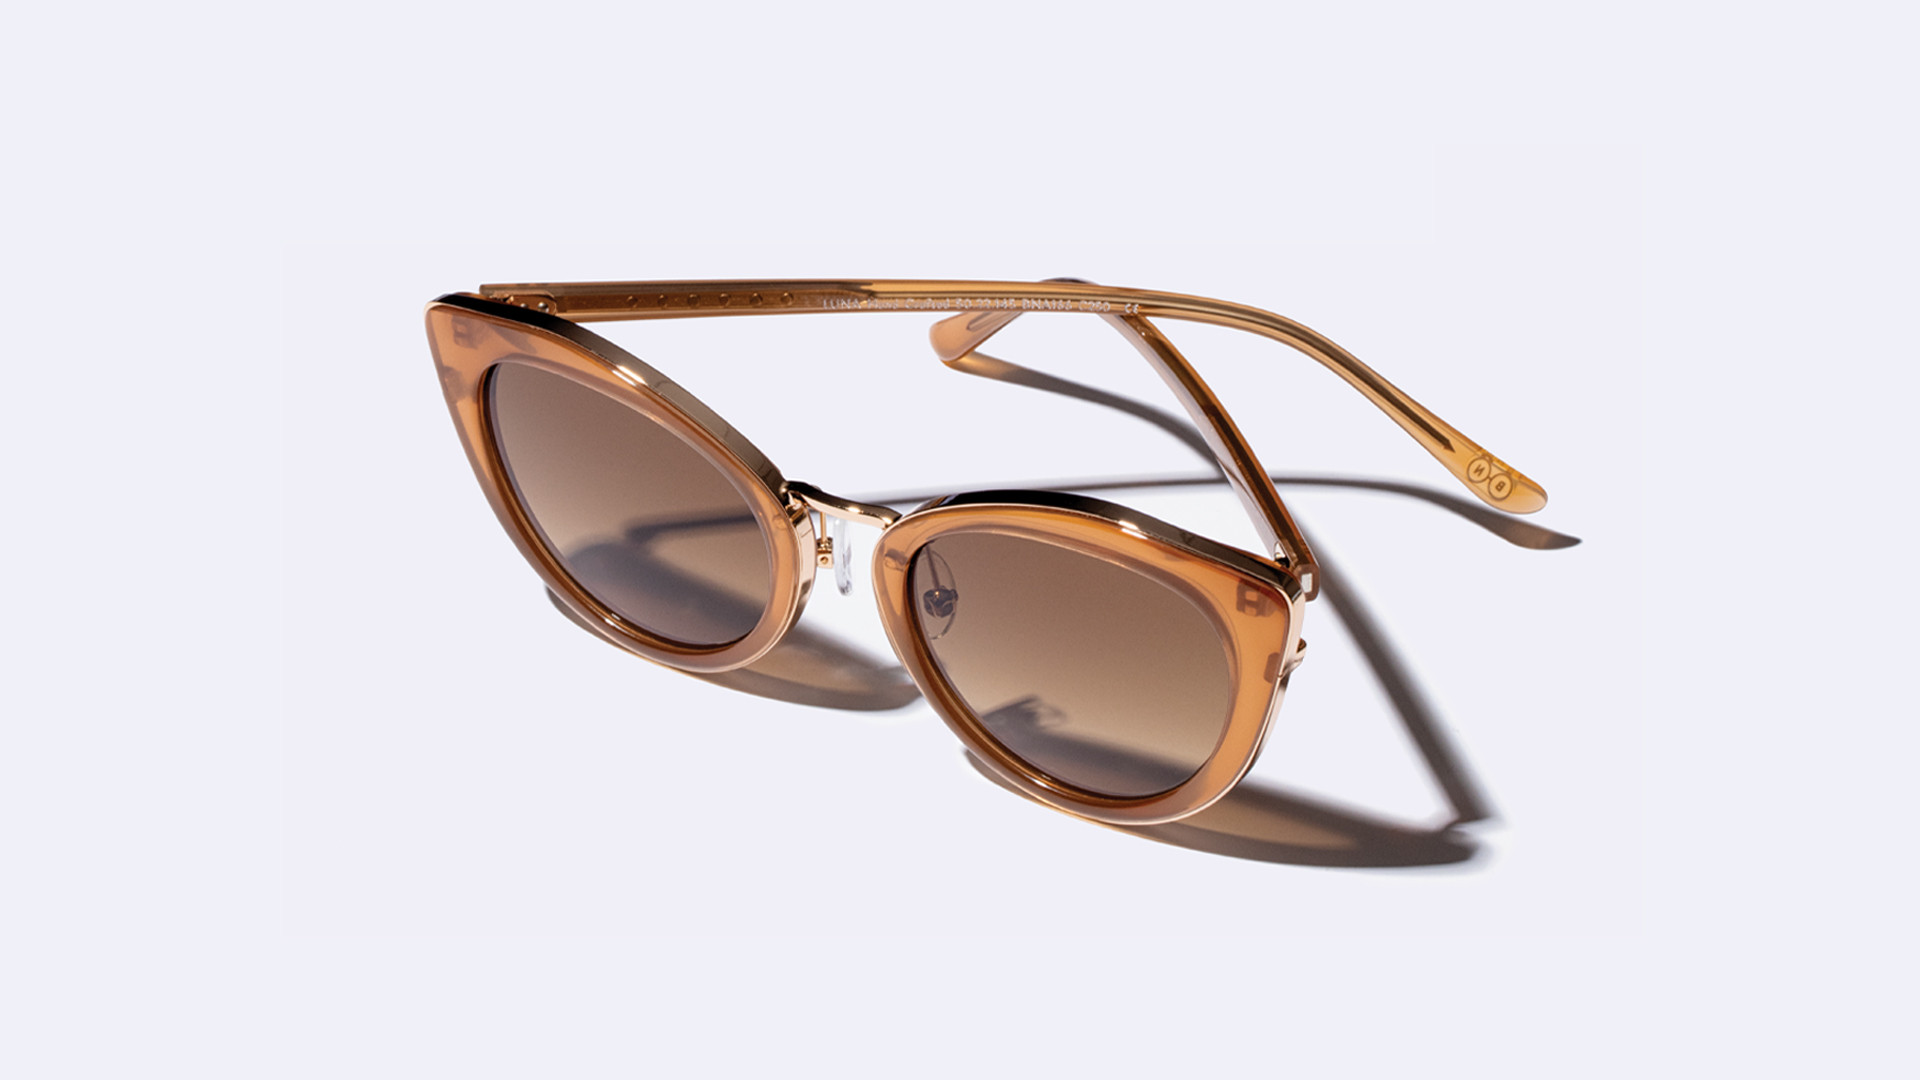 Bailey Nelson Luna sunglasses